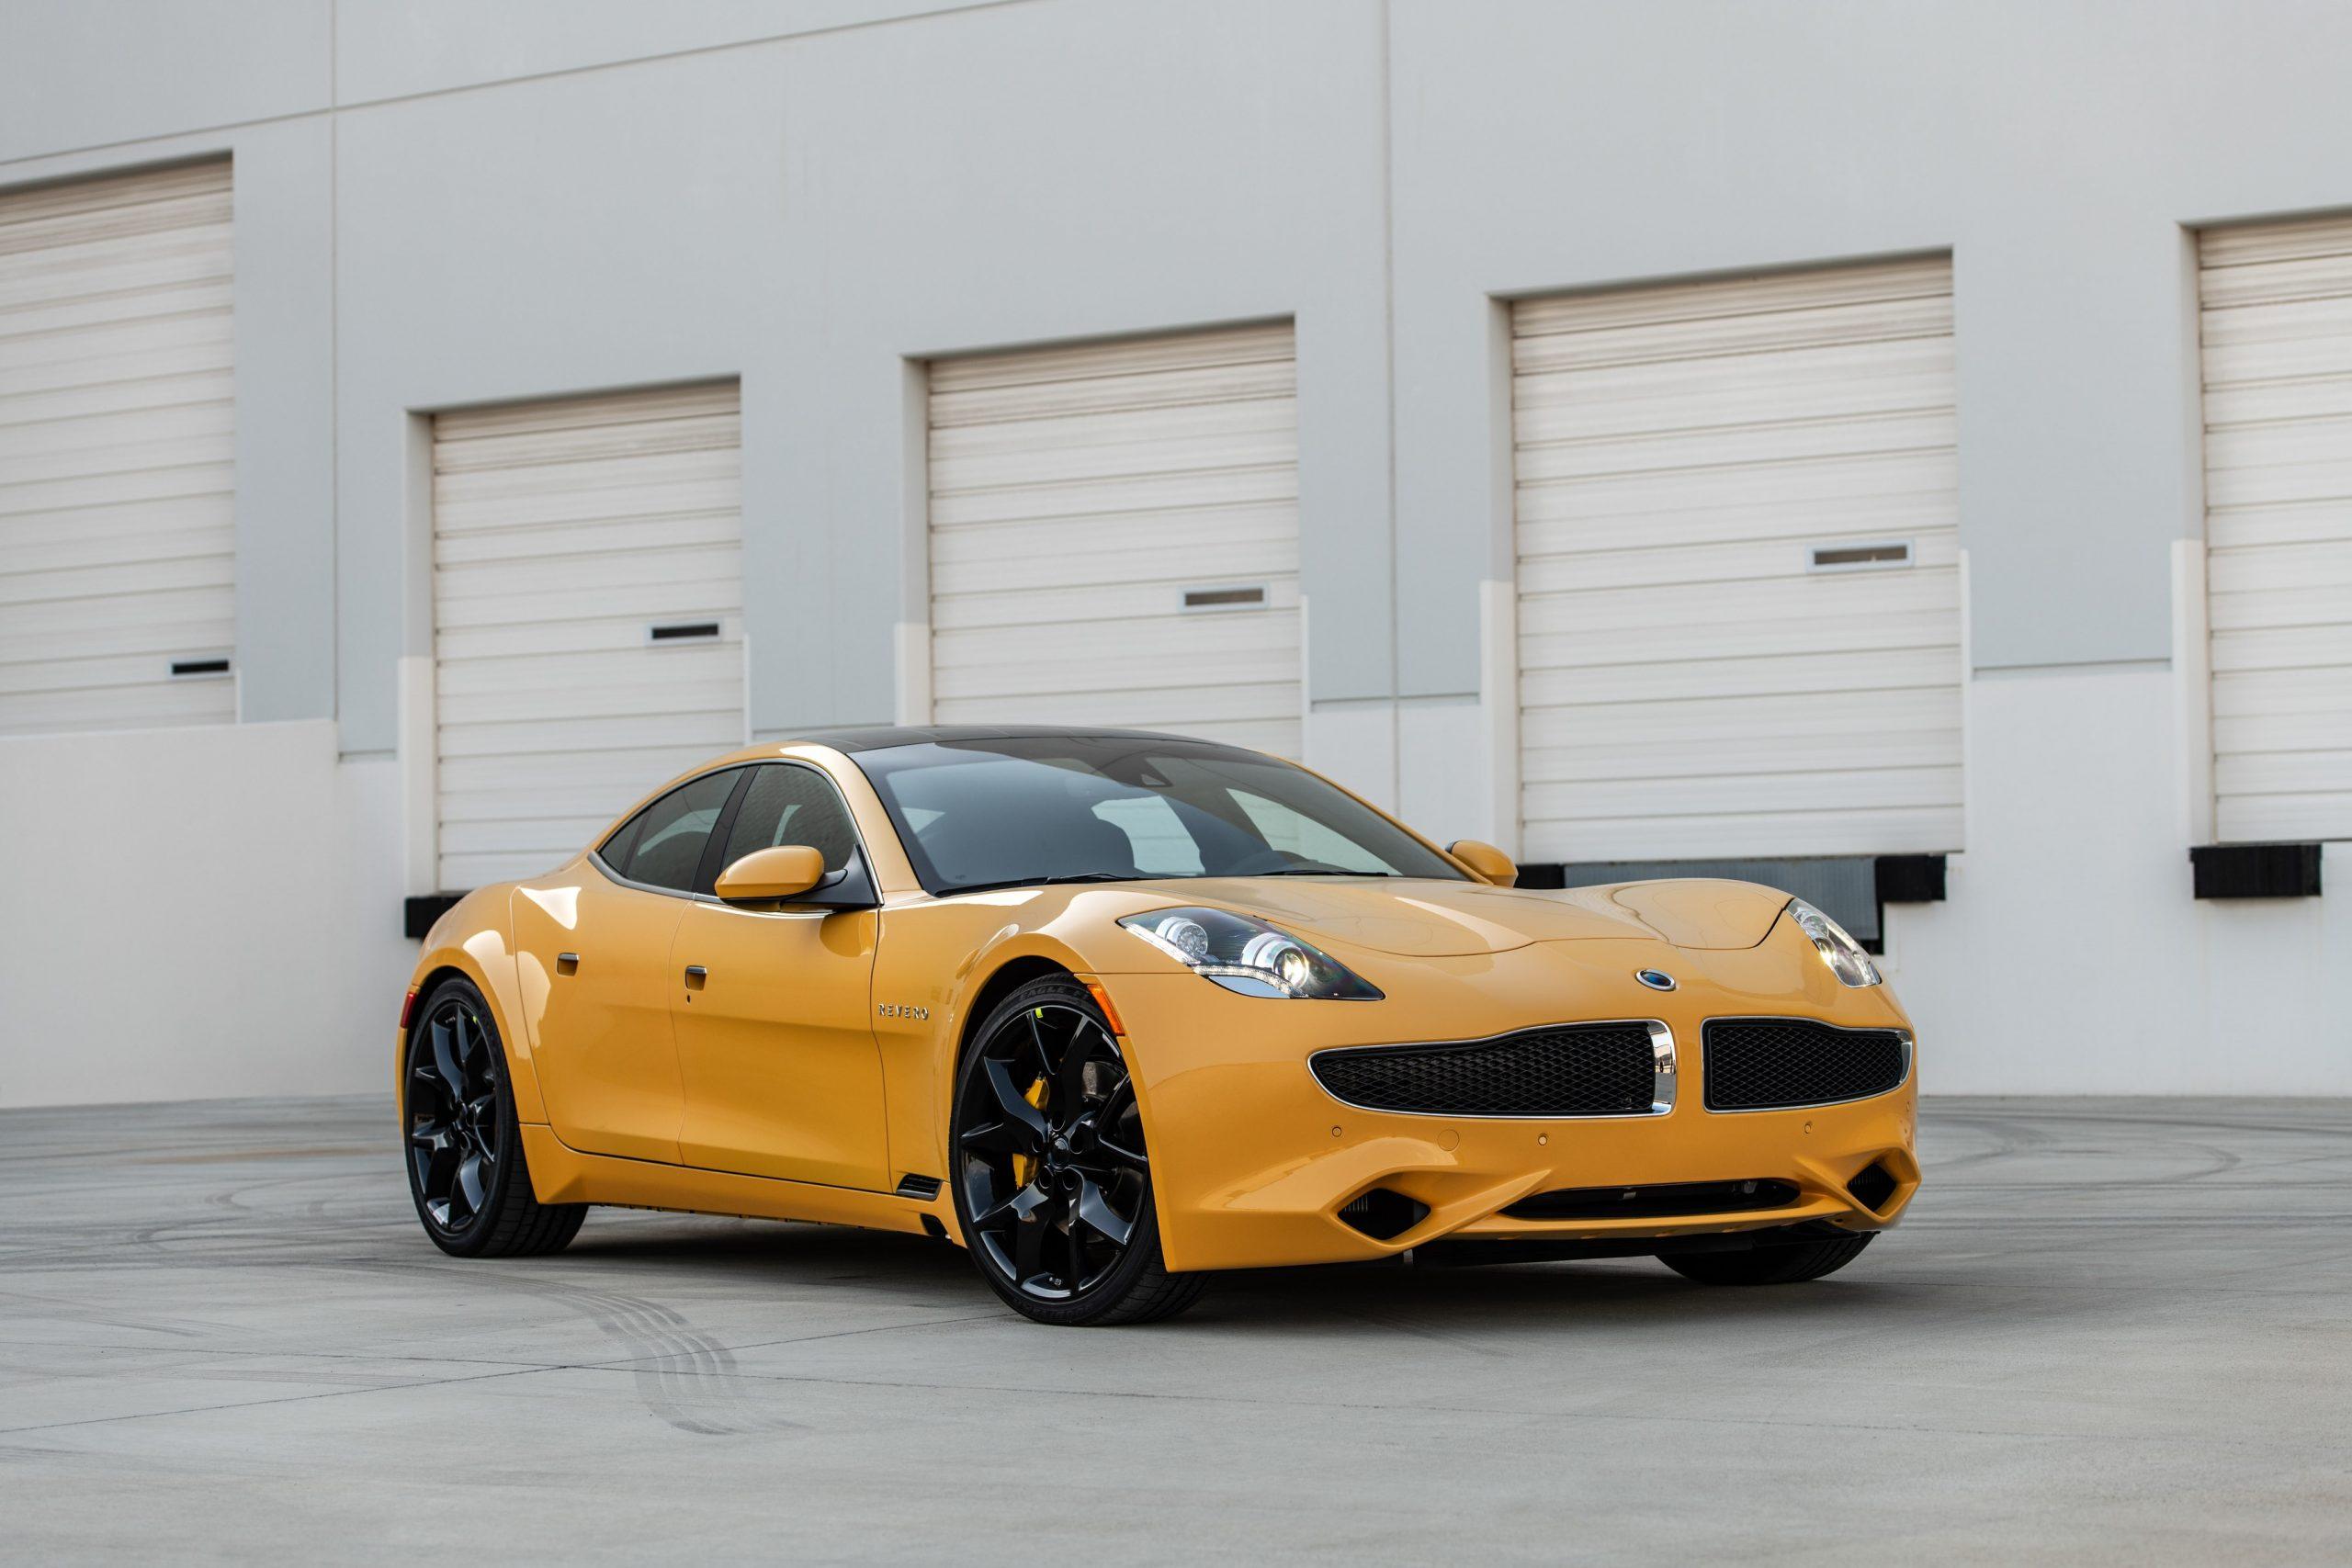 Flame Yellow 1595